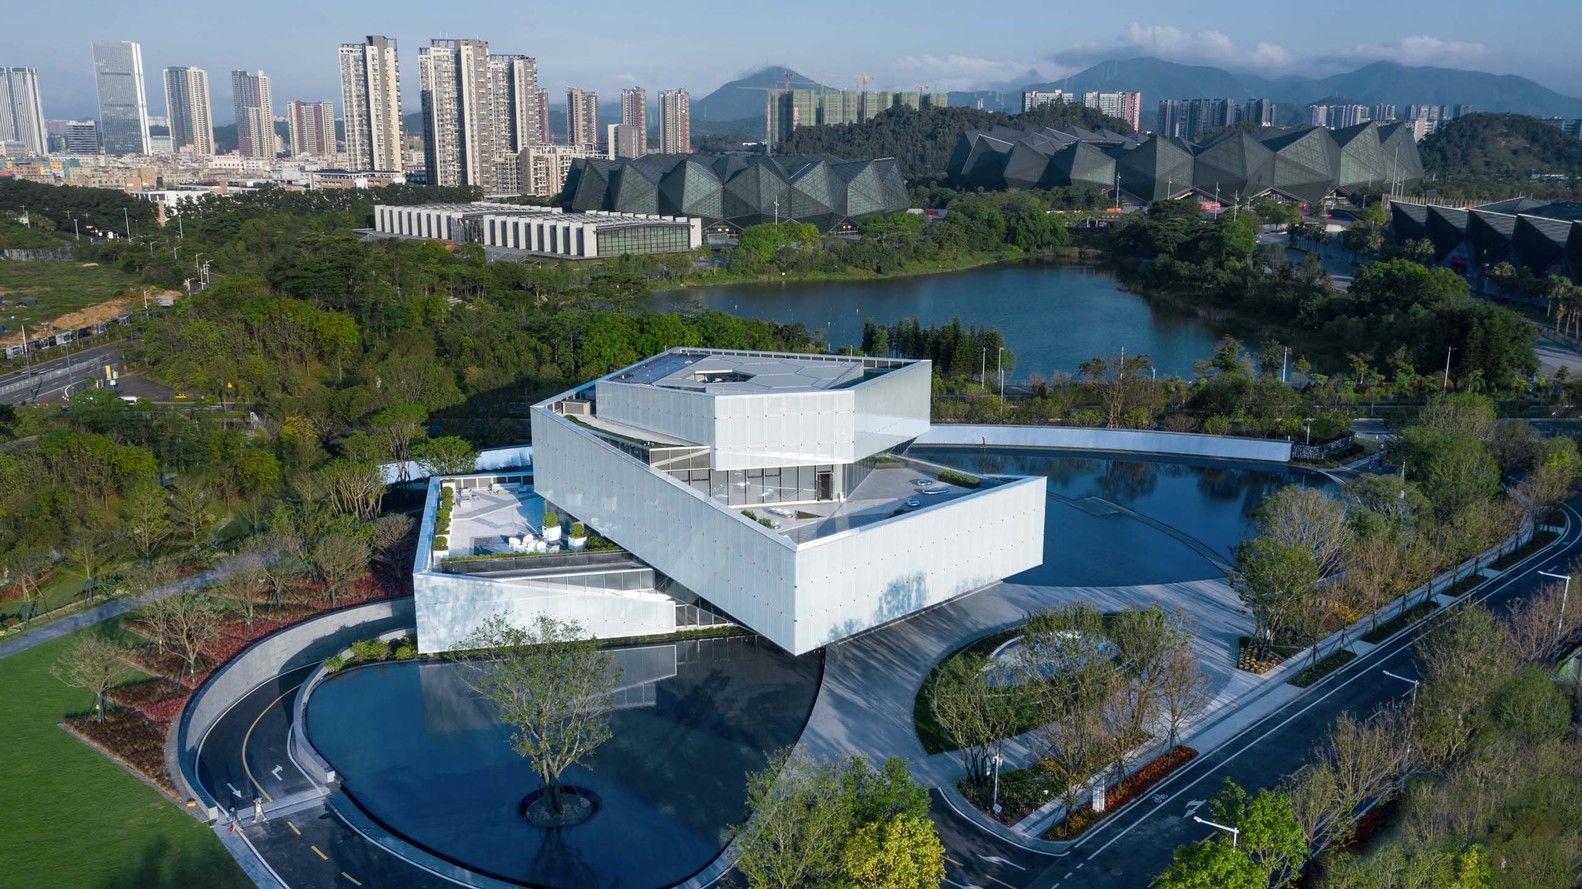 Gallery Of Exhibition Center Of Shimao Shenzhen Hong Kong International Center Shuishi 10 Architecture Design Shenzhen